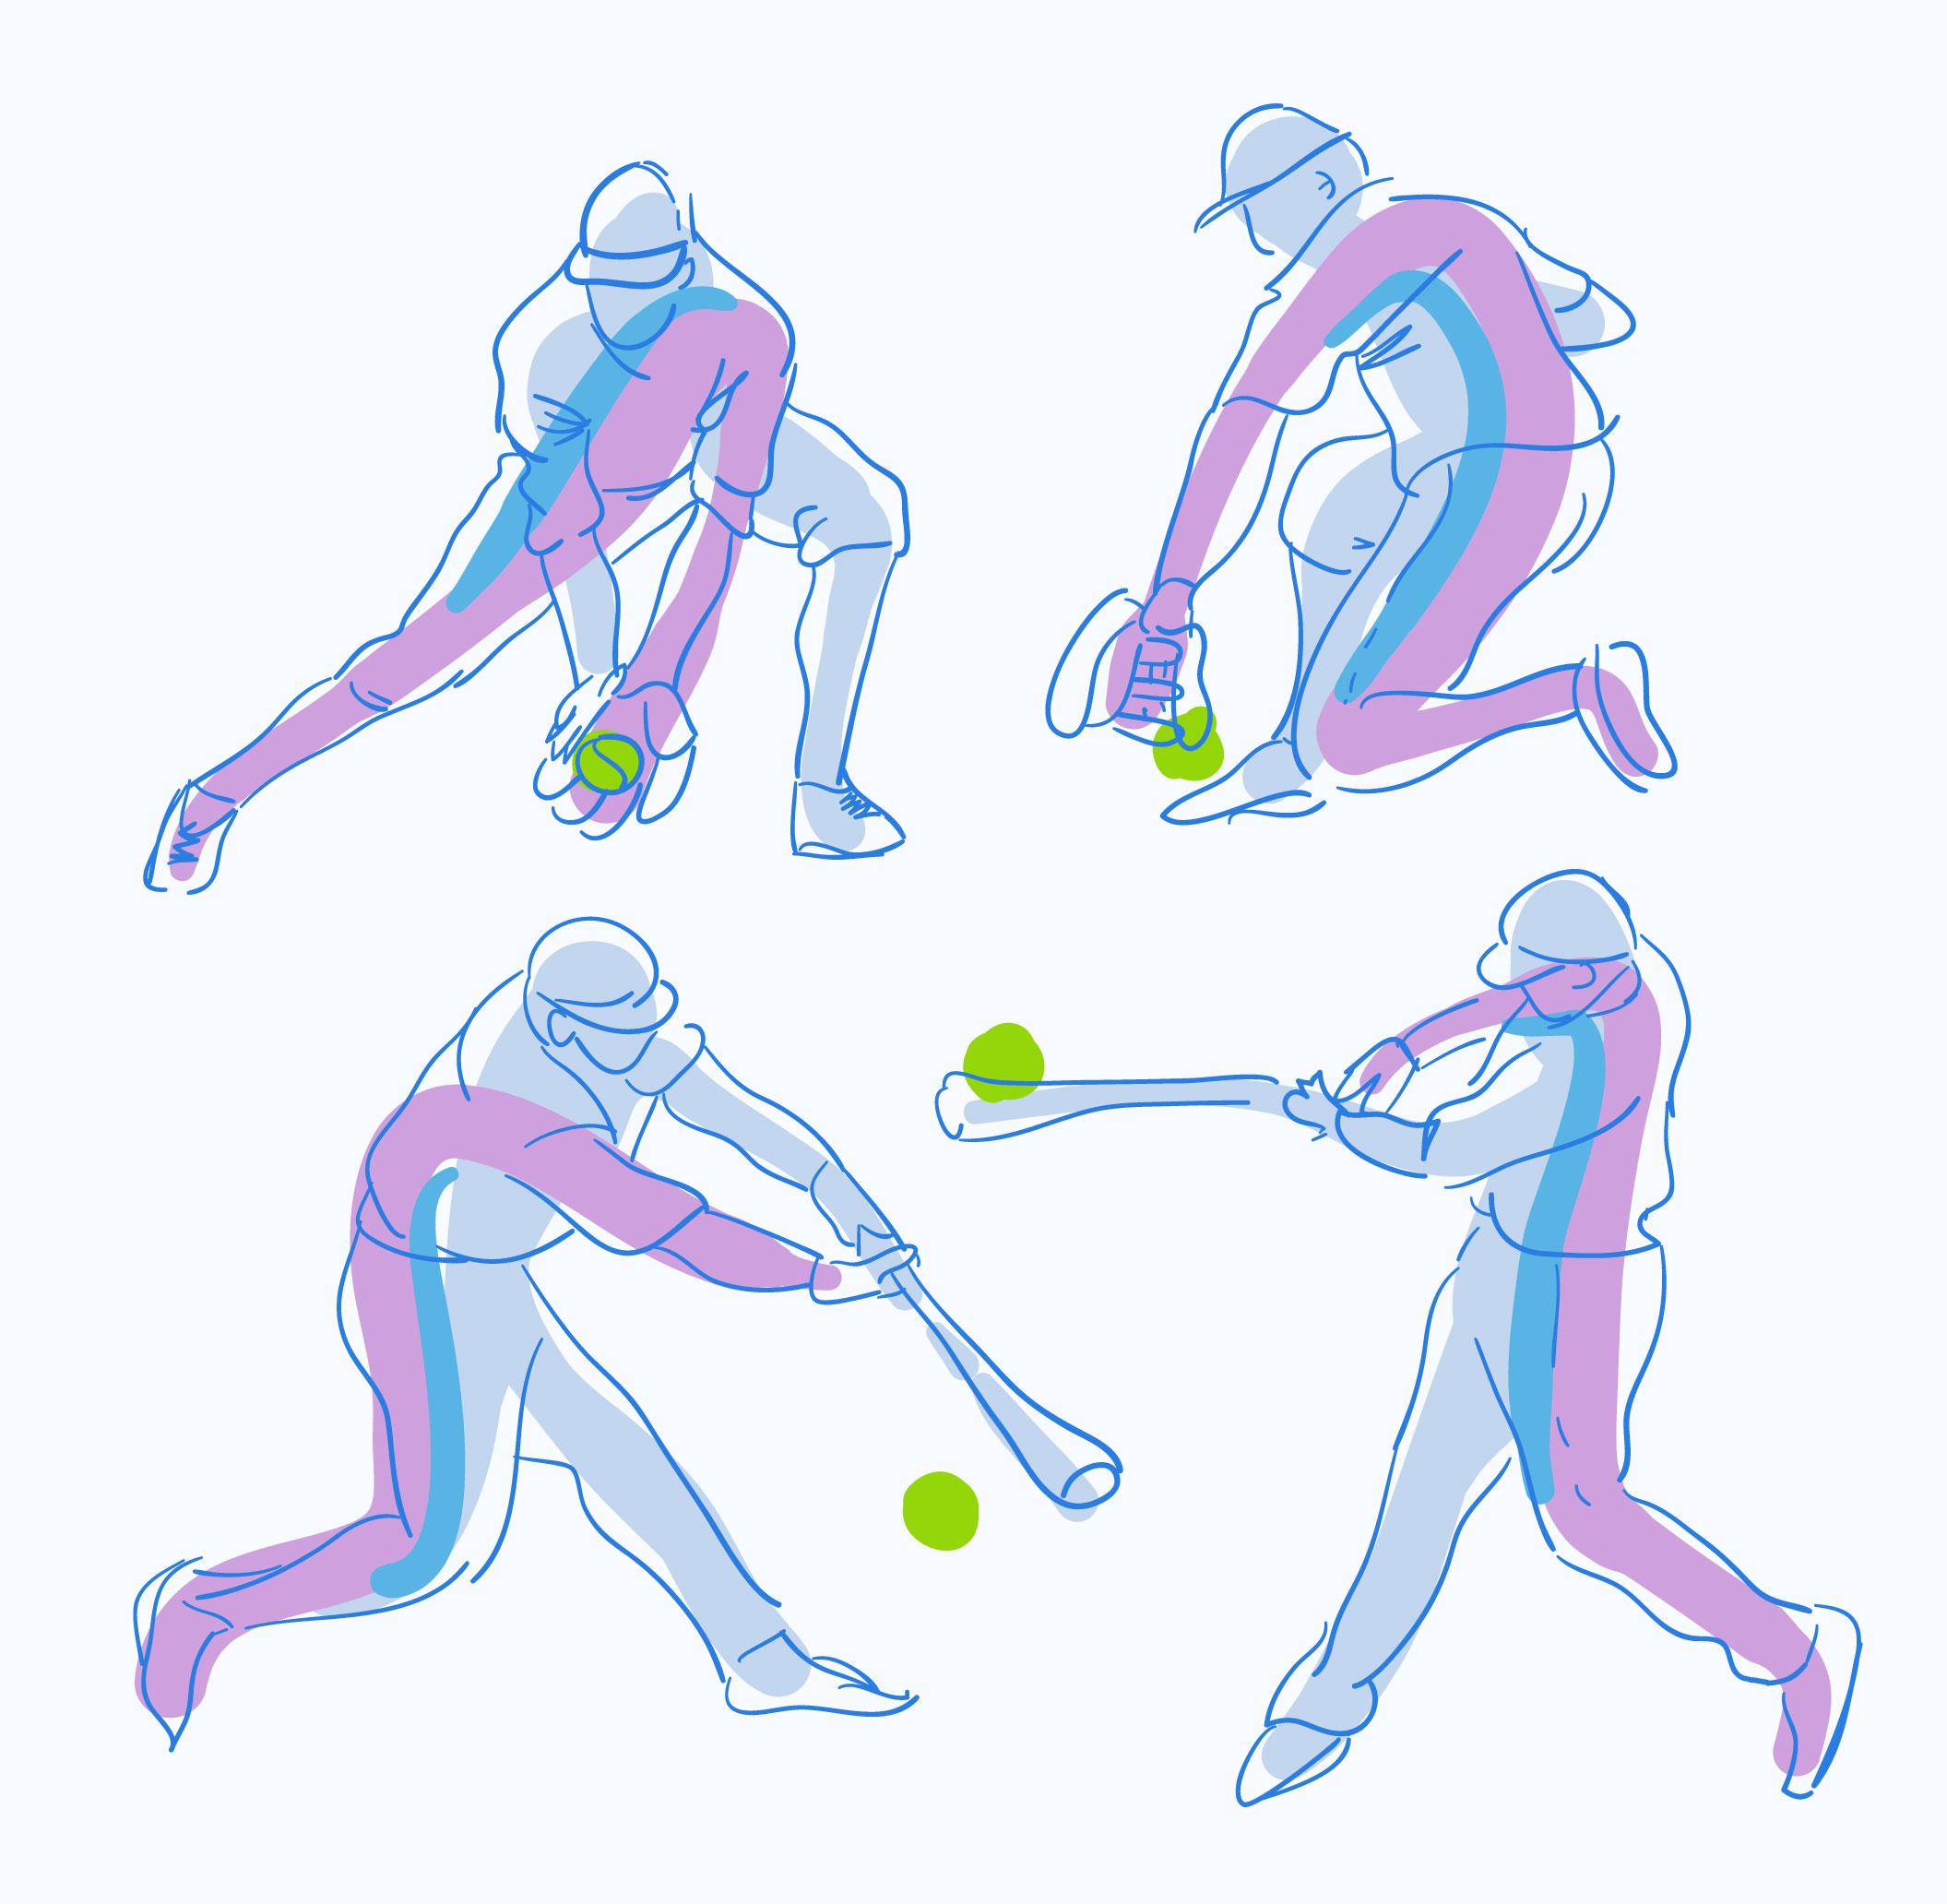 abstract baseball player pose sketch hand drawn vector